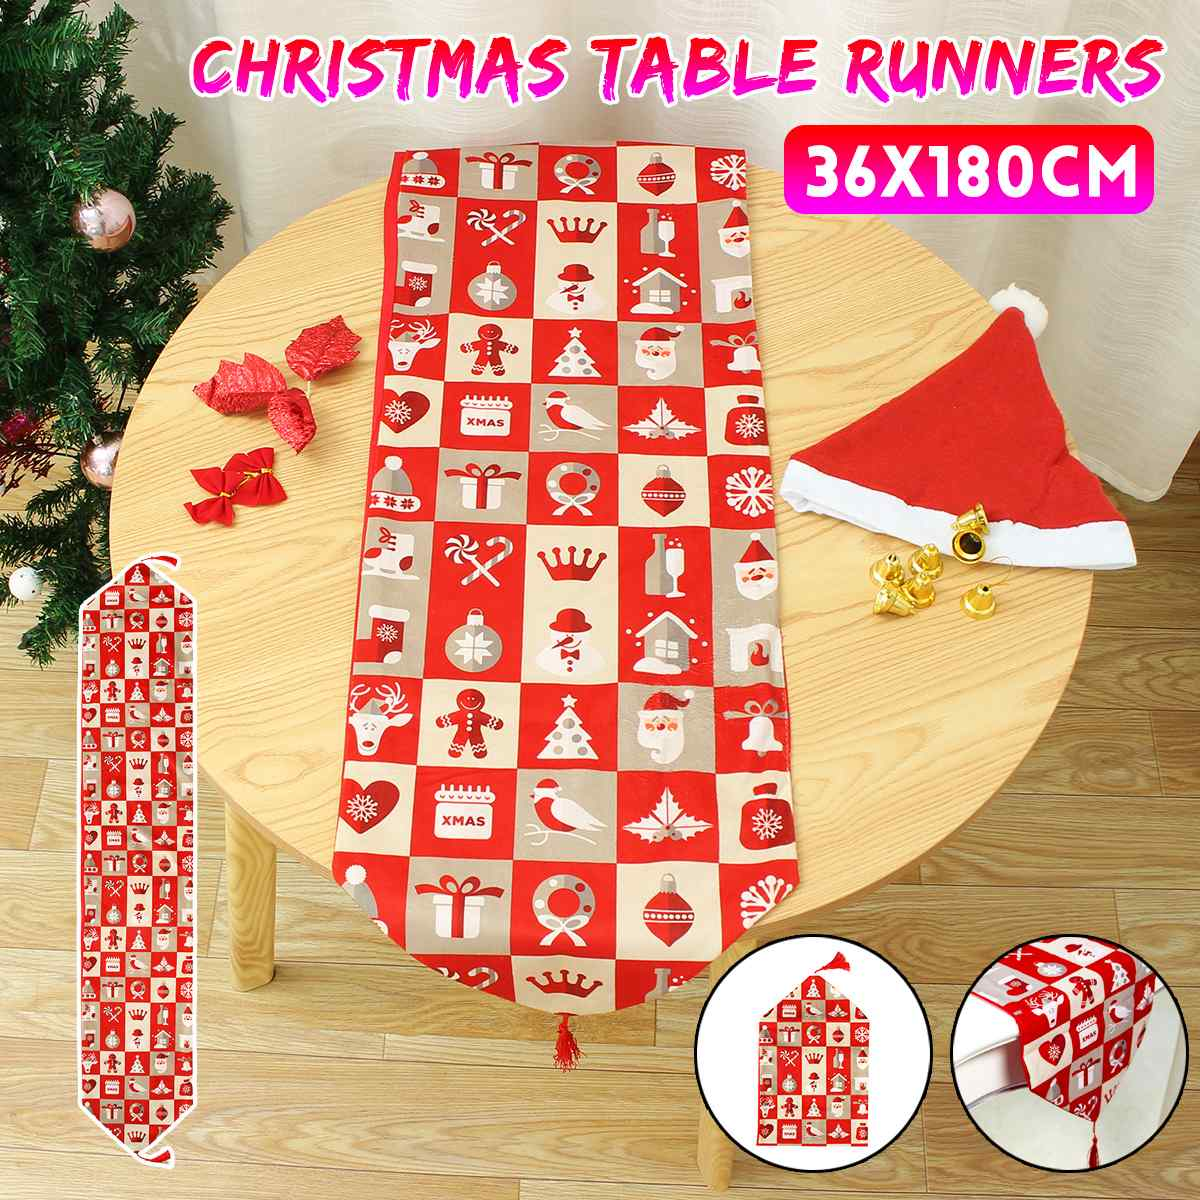 Christmas Table Runners Decoration Linen Printed Long Table Flag For Home Christmas Festival Table Runners Decorations 180*36CM